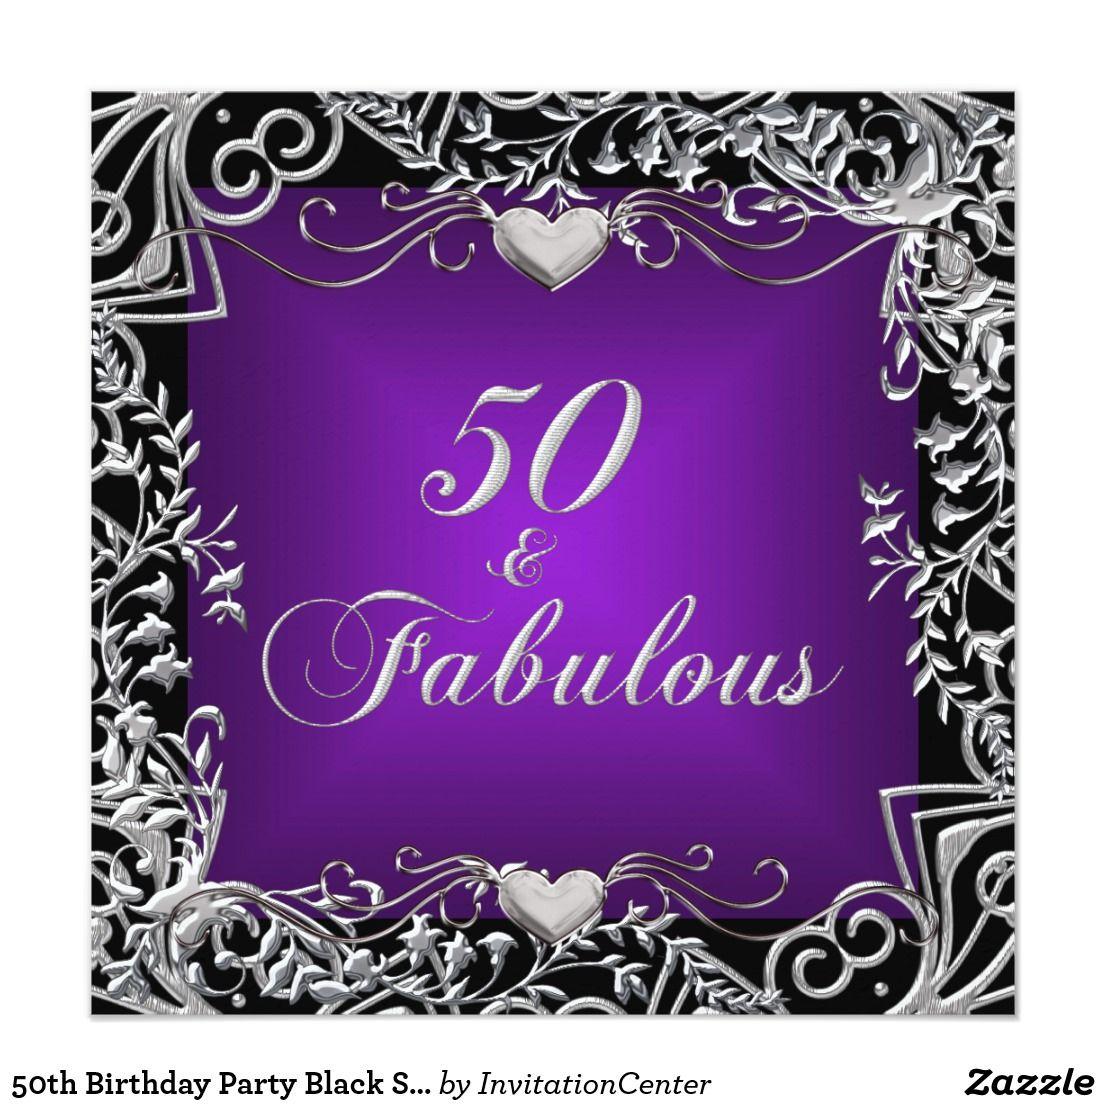 50th Birthday Party Black Silver Deep Purple Card